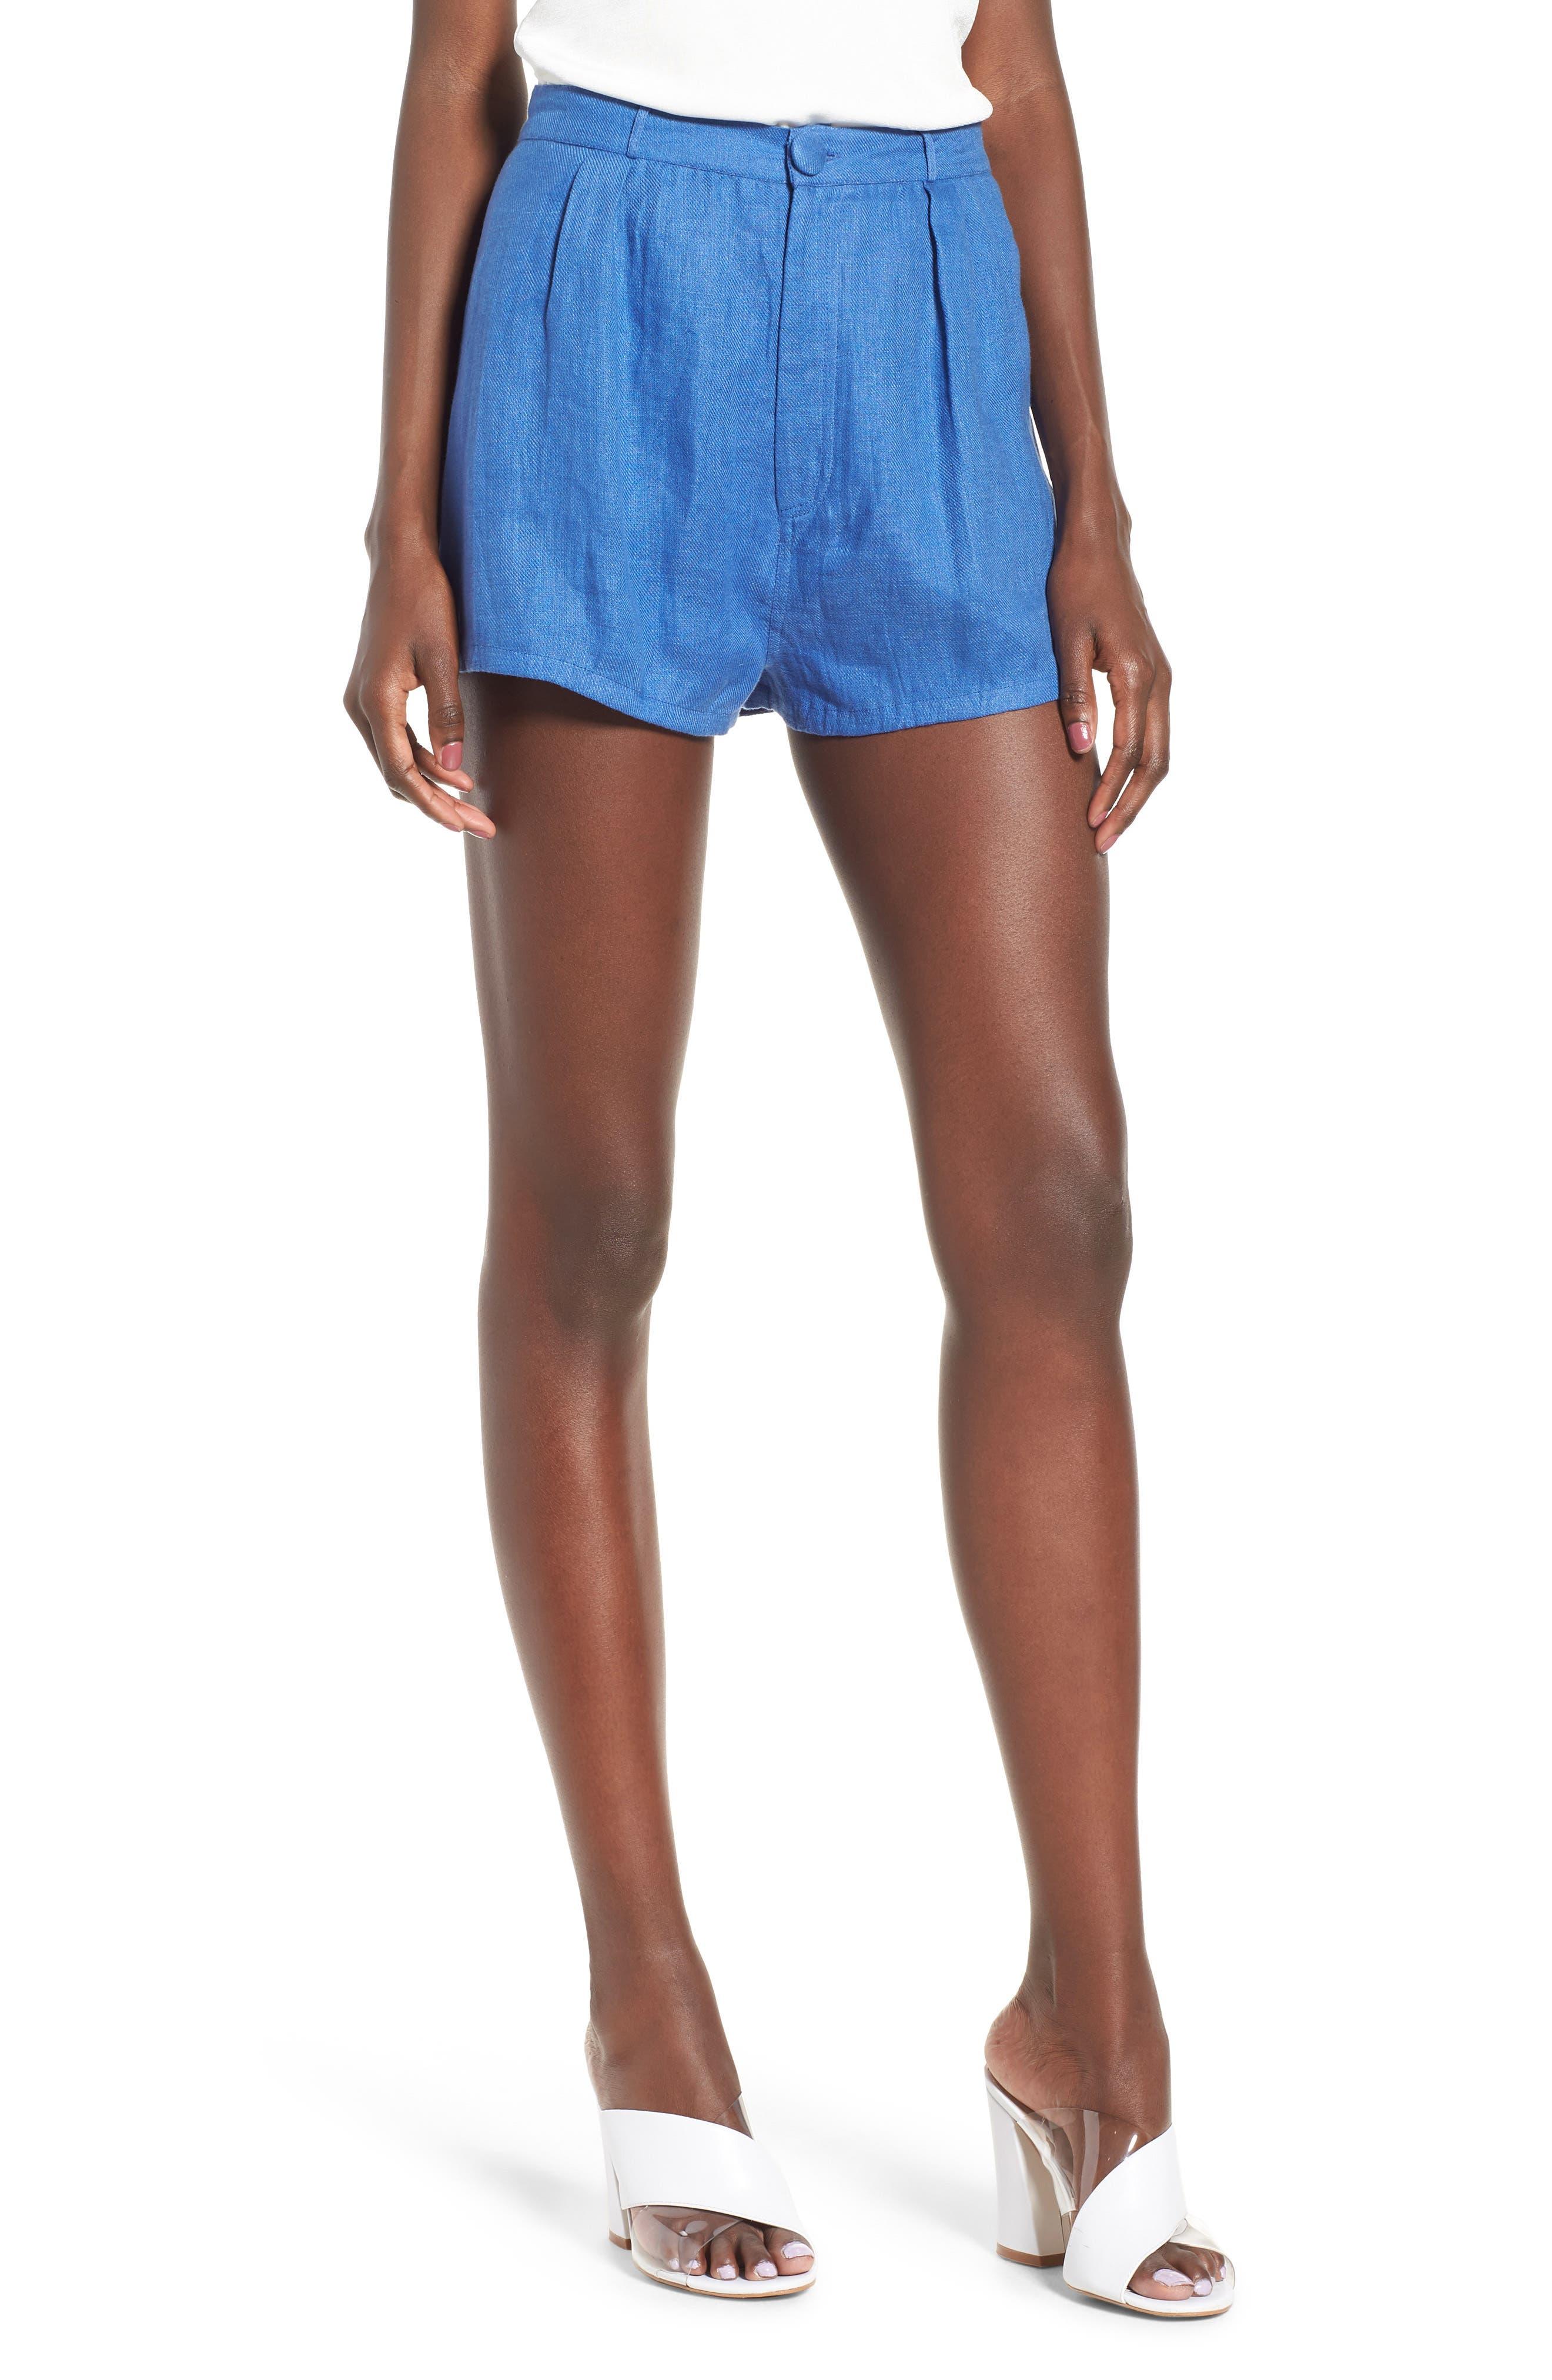 Jordy High Waist Shorts,                             Main thumbnail 1, color,                             Blue